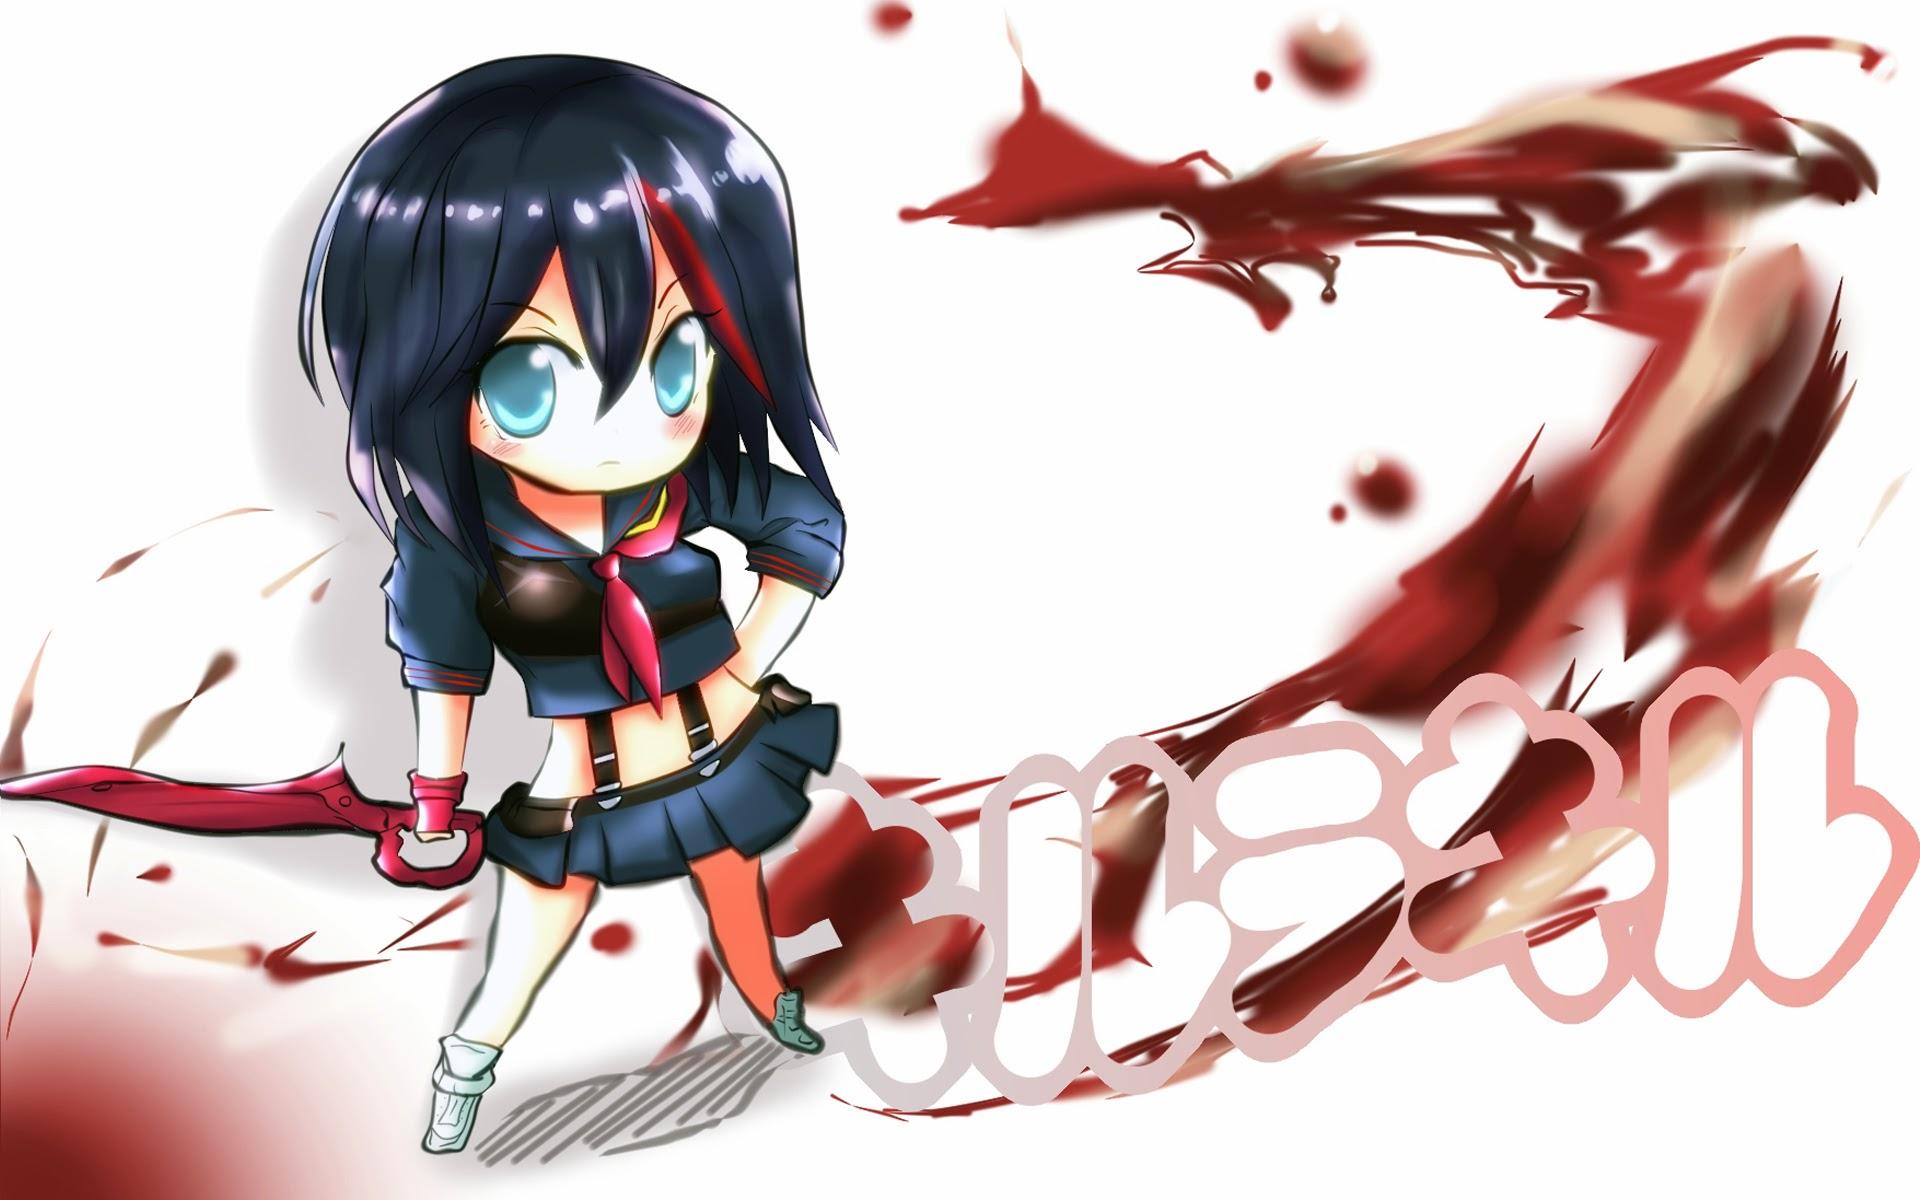 Matoi Ryuko Chibi Anime 4q Wallpaper HD 1920x1200